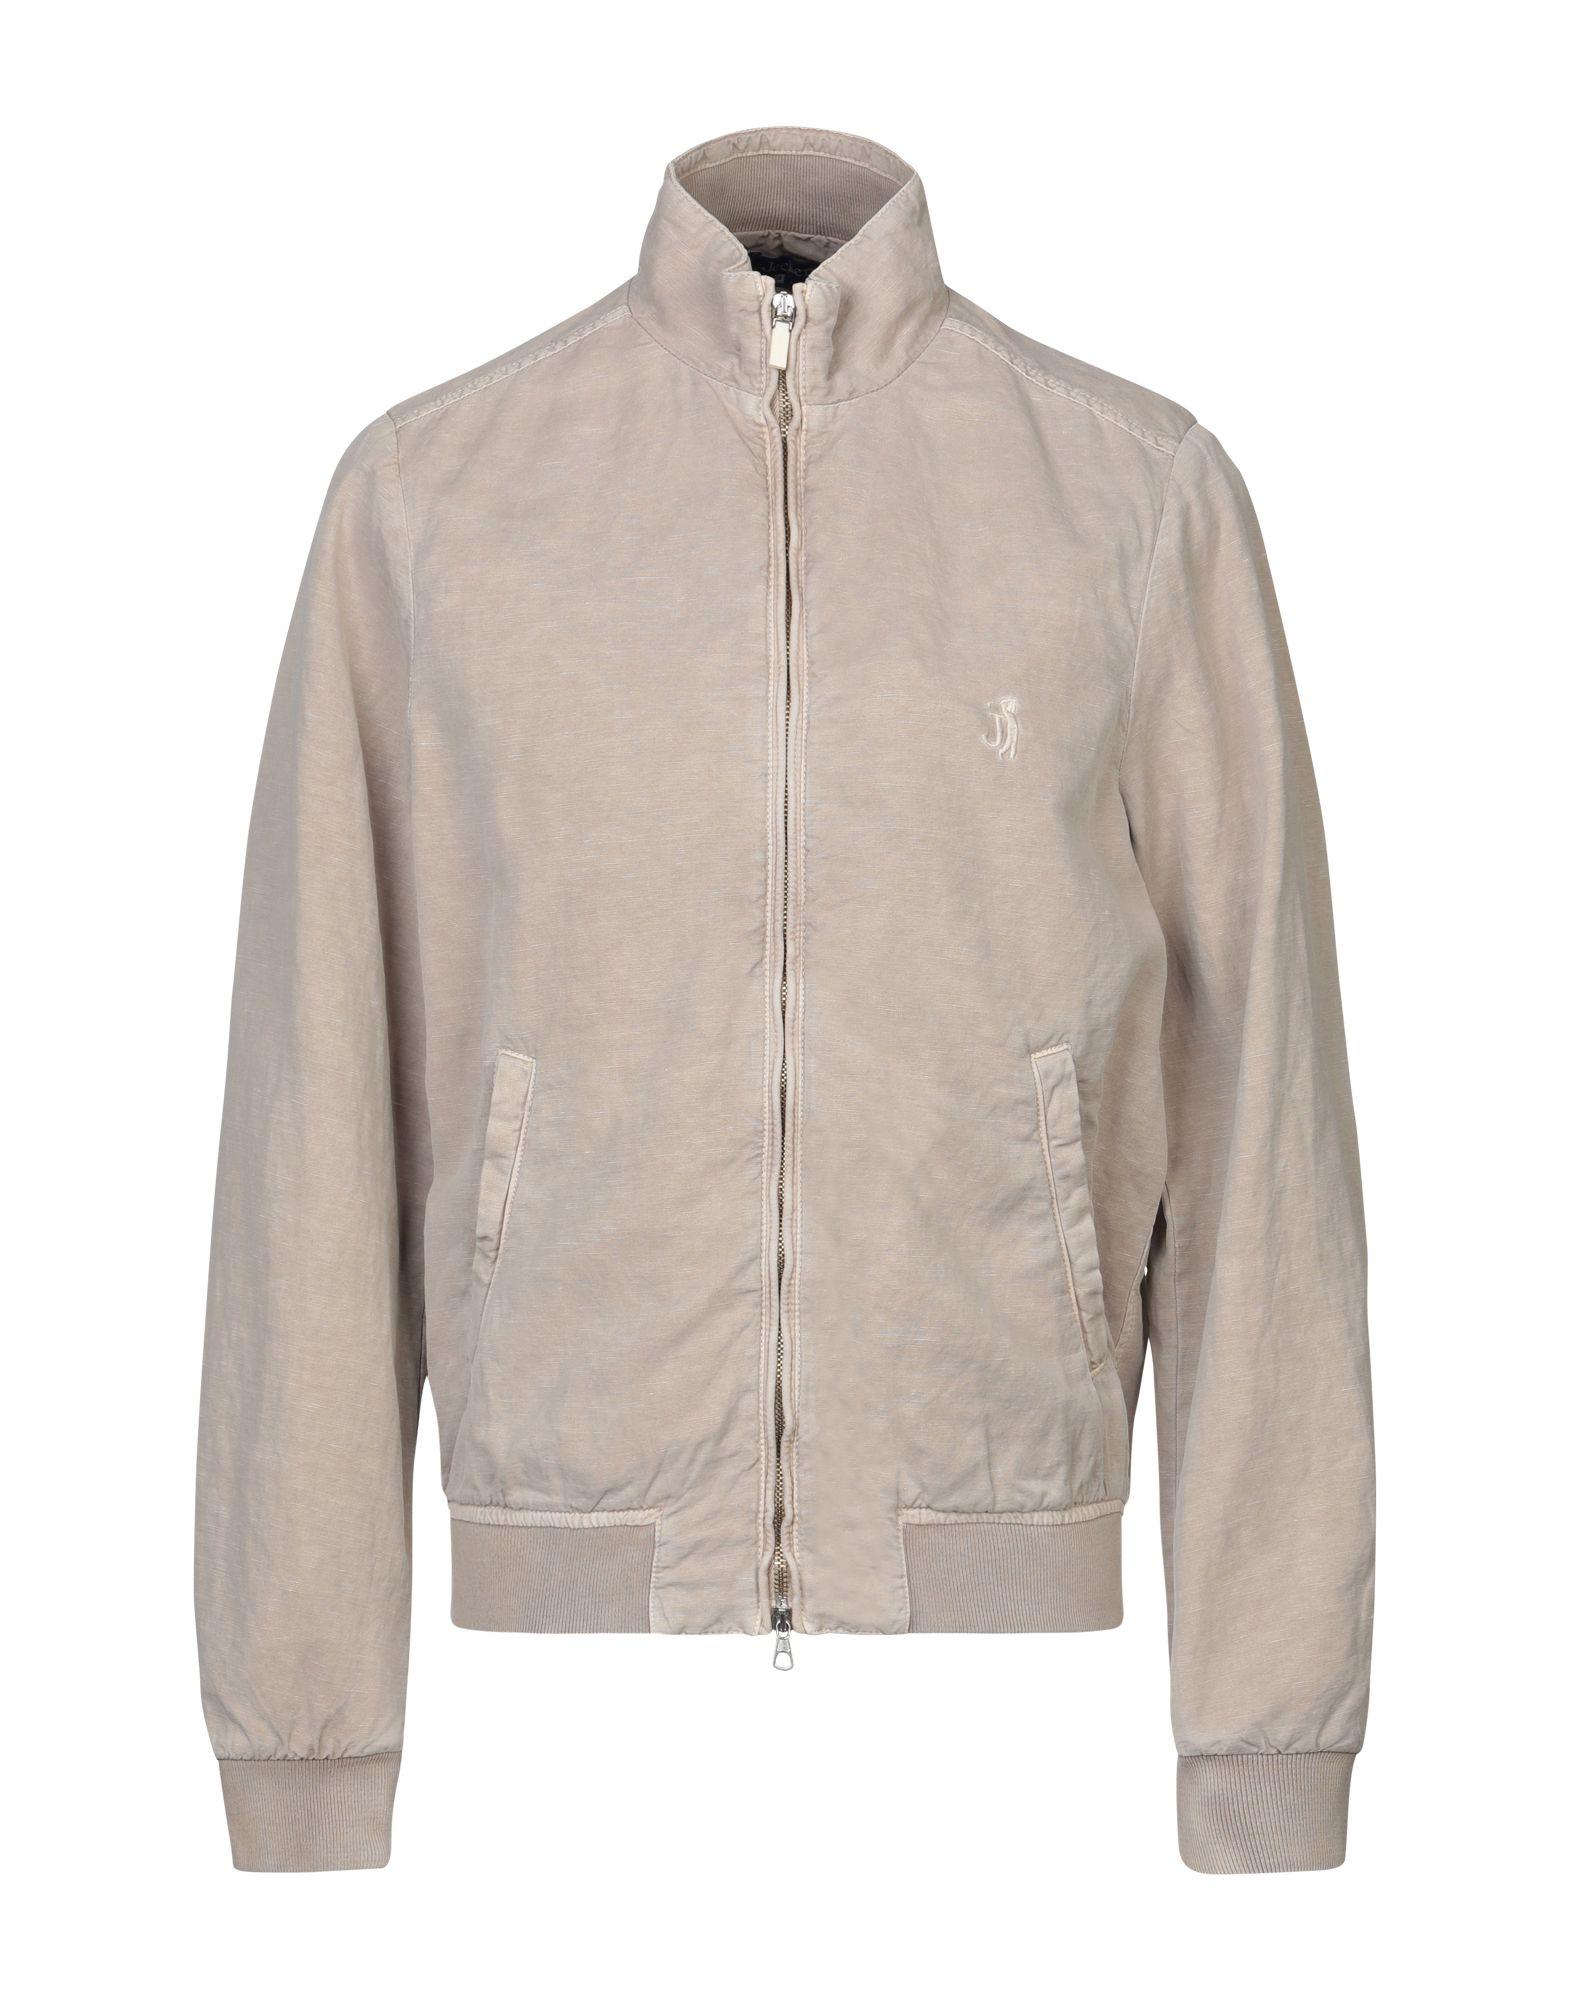 JECKERSON Куртка elsy куртка elsy 4260 0t31 sp ghisa 438 серый